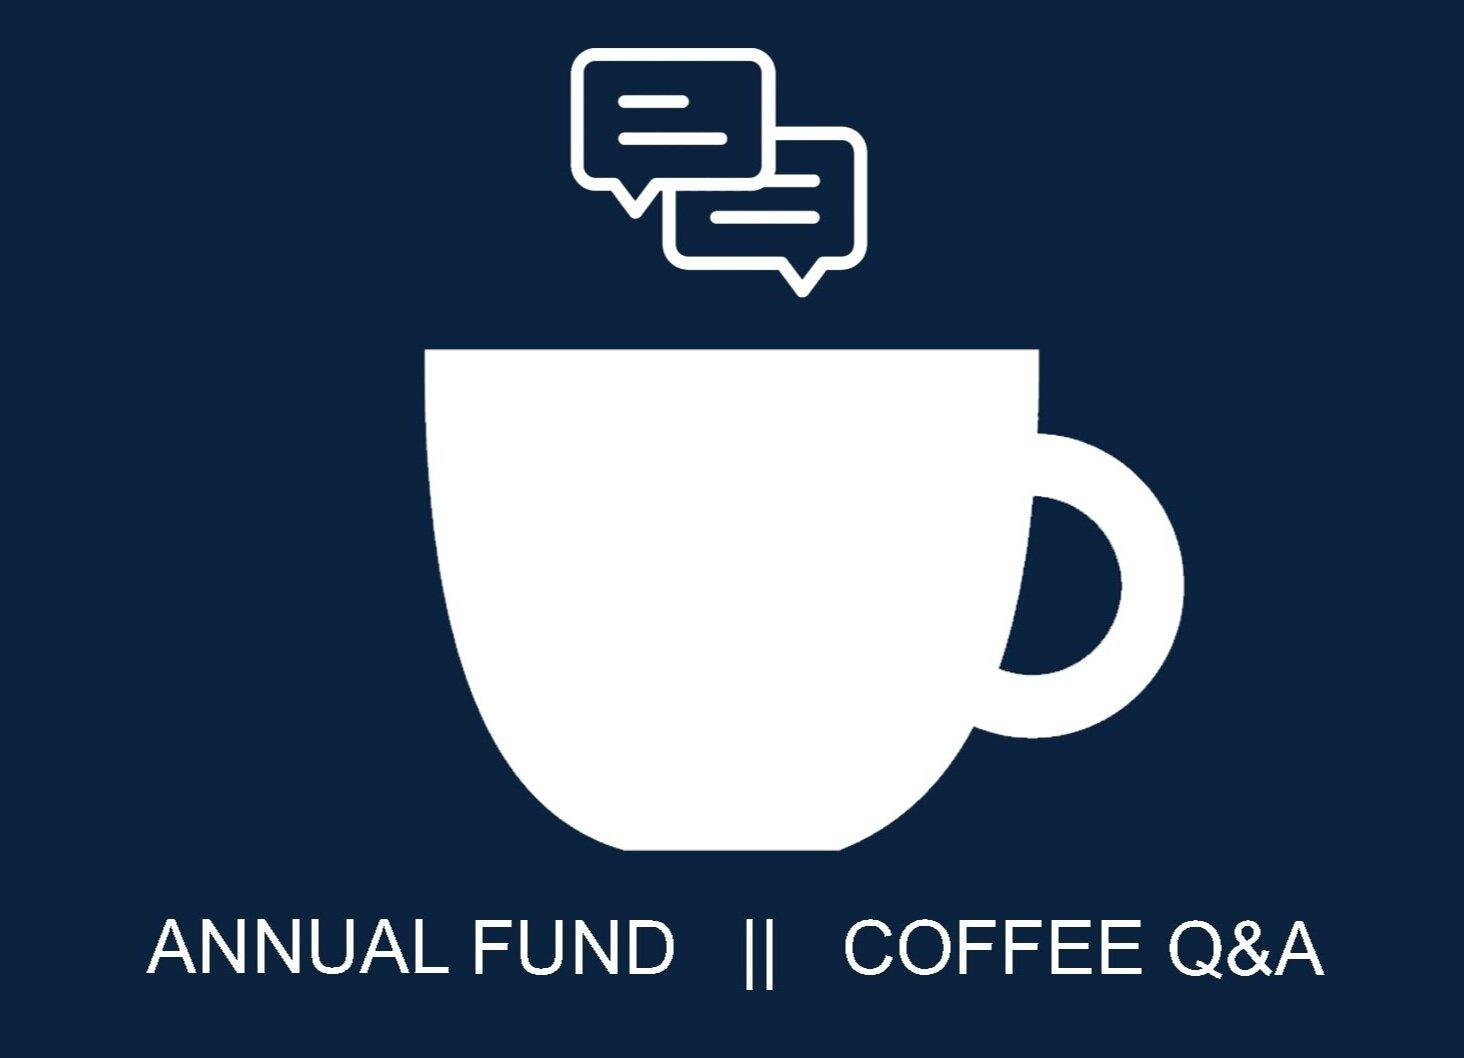 Coffee%2BQ%2526A_No%2BRSVP.jpg